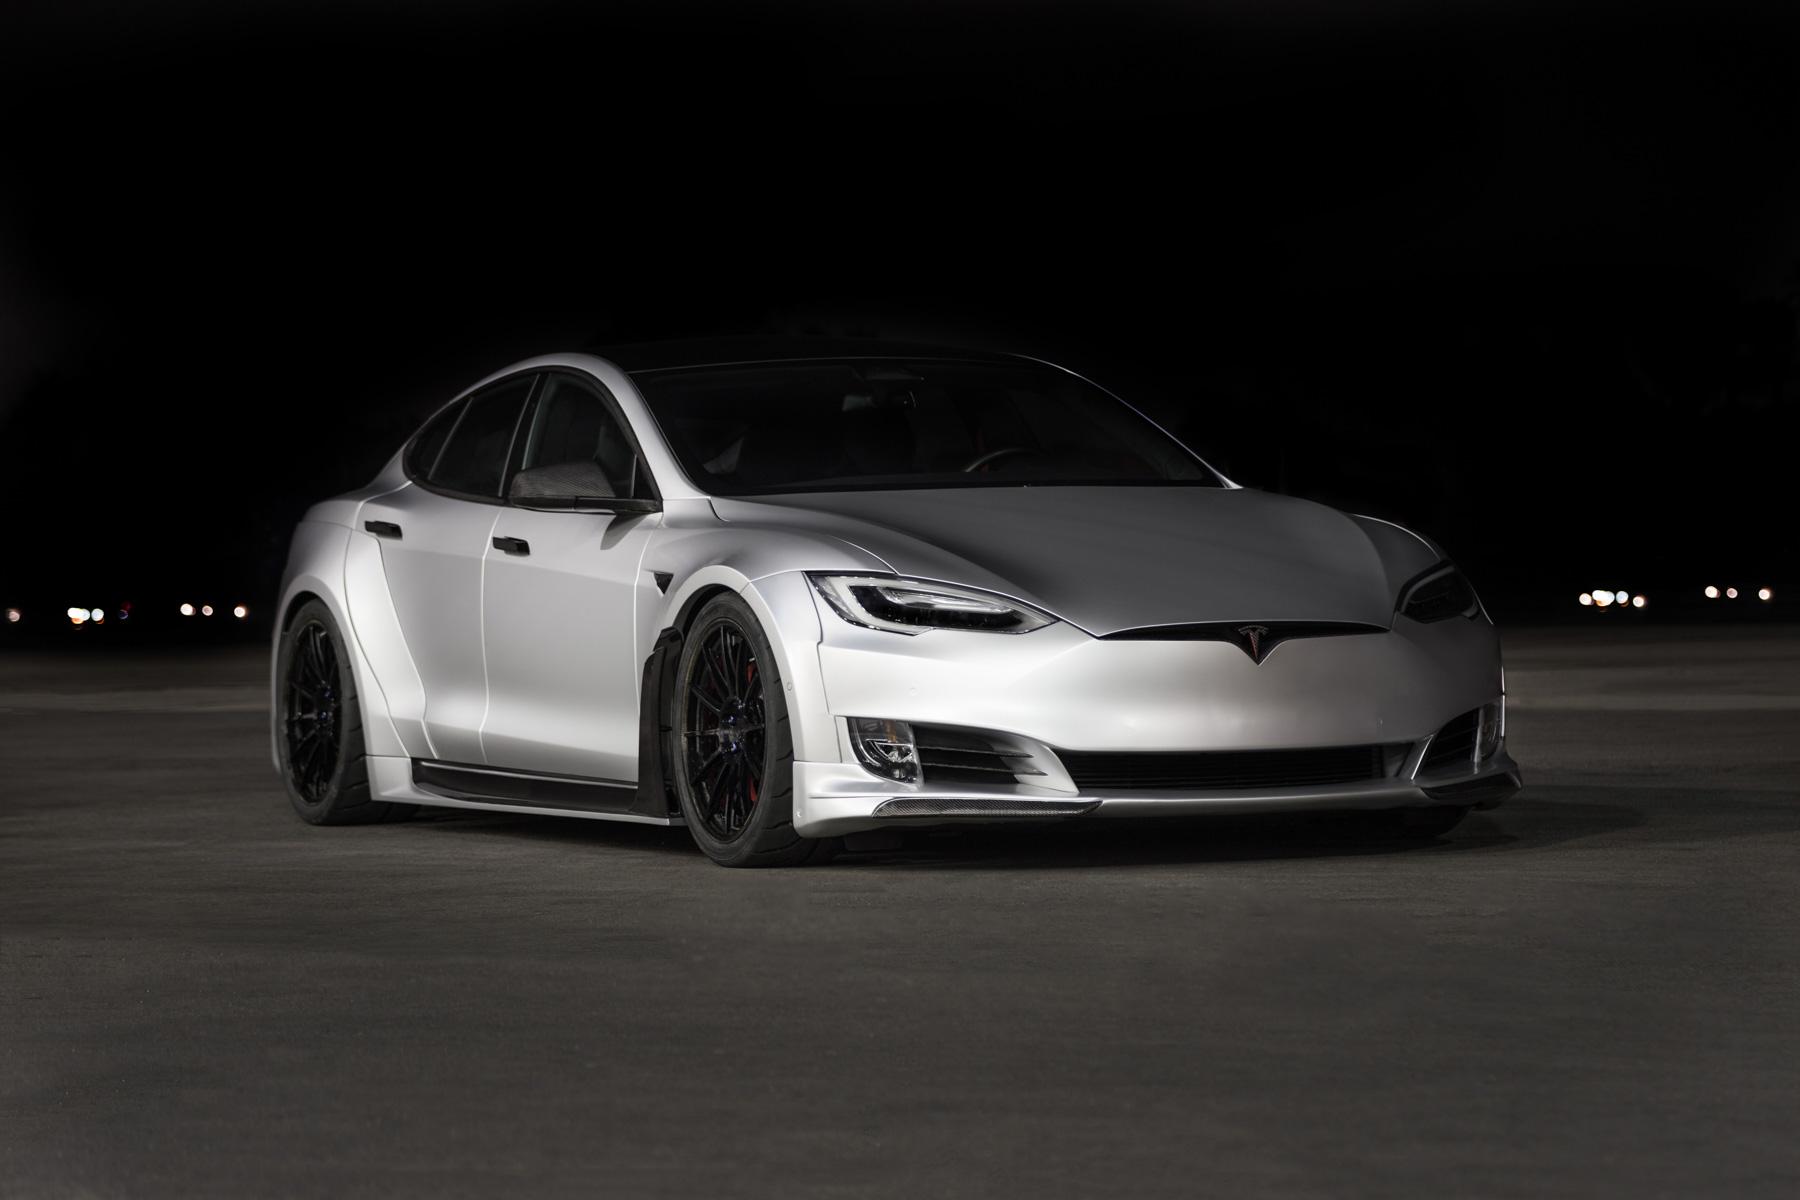 Tesla (TSLA) подняла целевую цену после рекордного квартала до 75 долларов